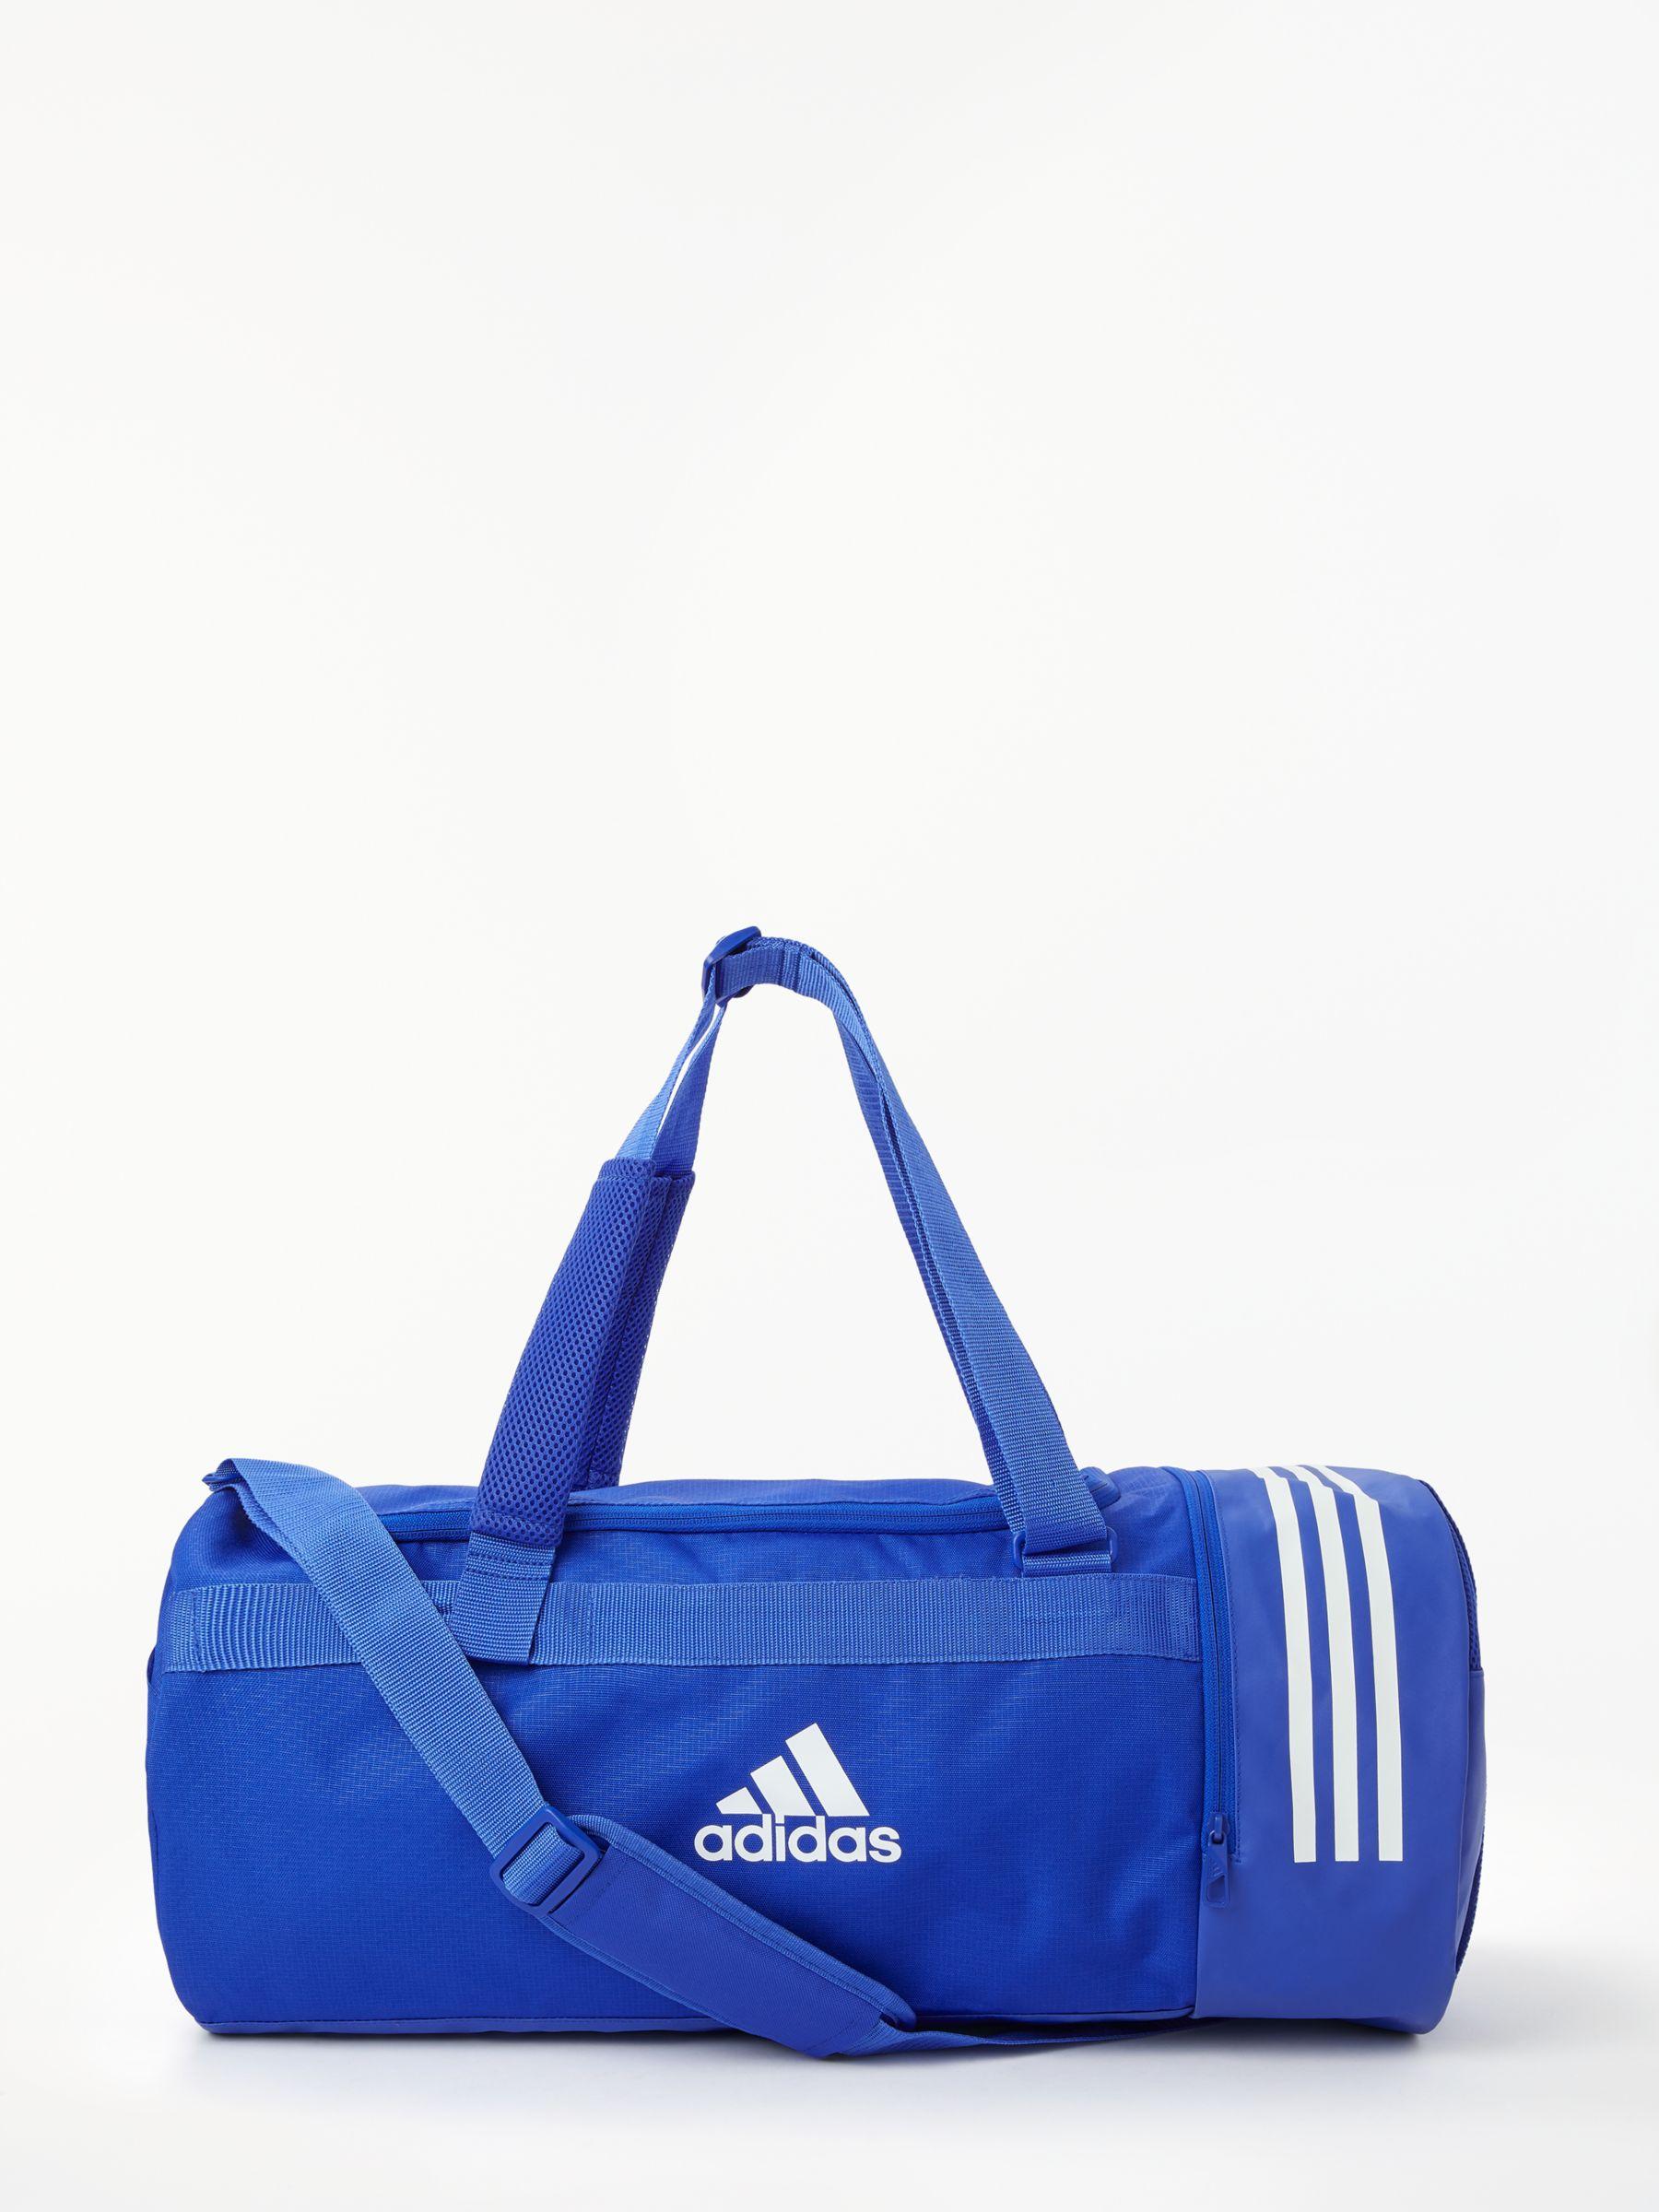 27079e721ac adidas Convertible 3-Stripes Duffle Bag, Medium at John Lewis   Partners